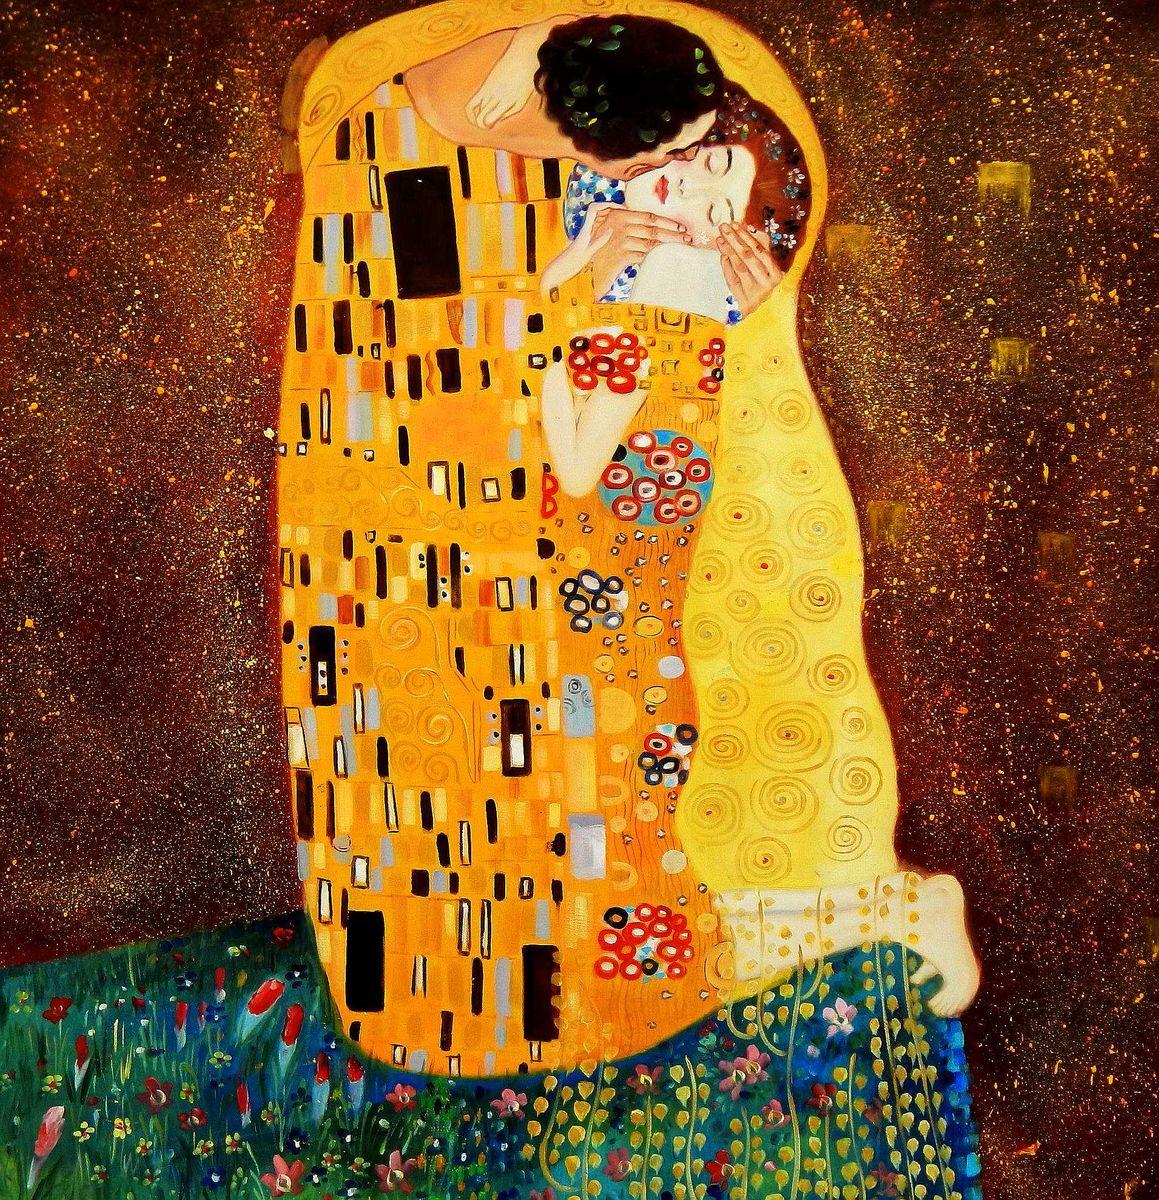 Gustav Klimt - Der Kuss h95894 90x90cm Jugendstil Ölgemälde handgemalt